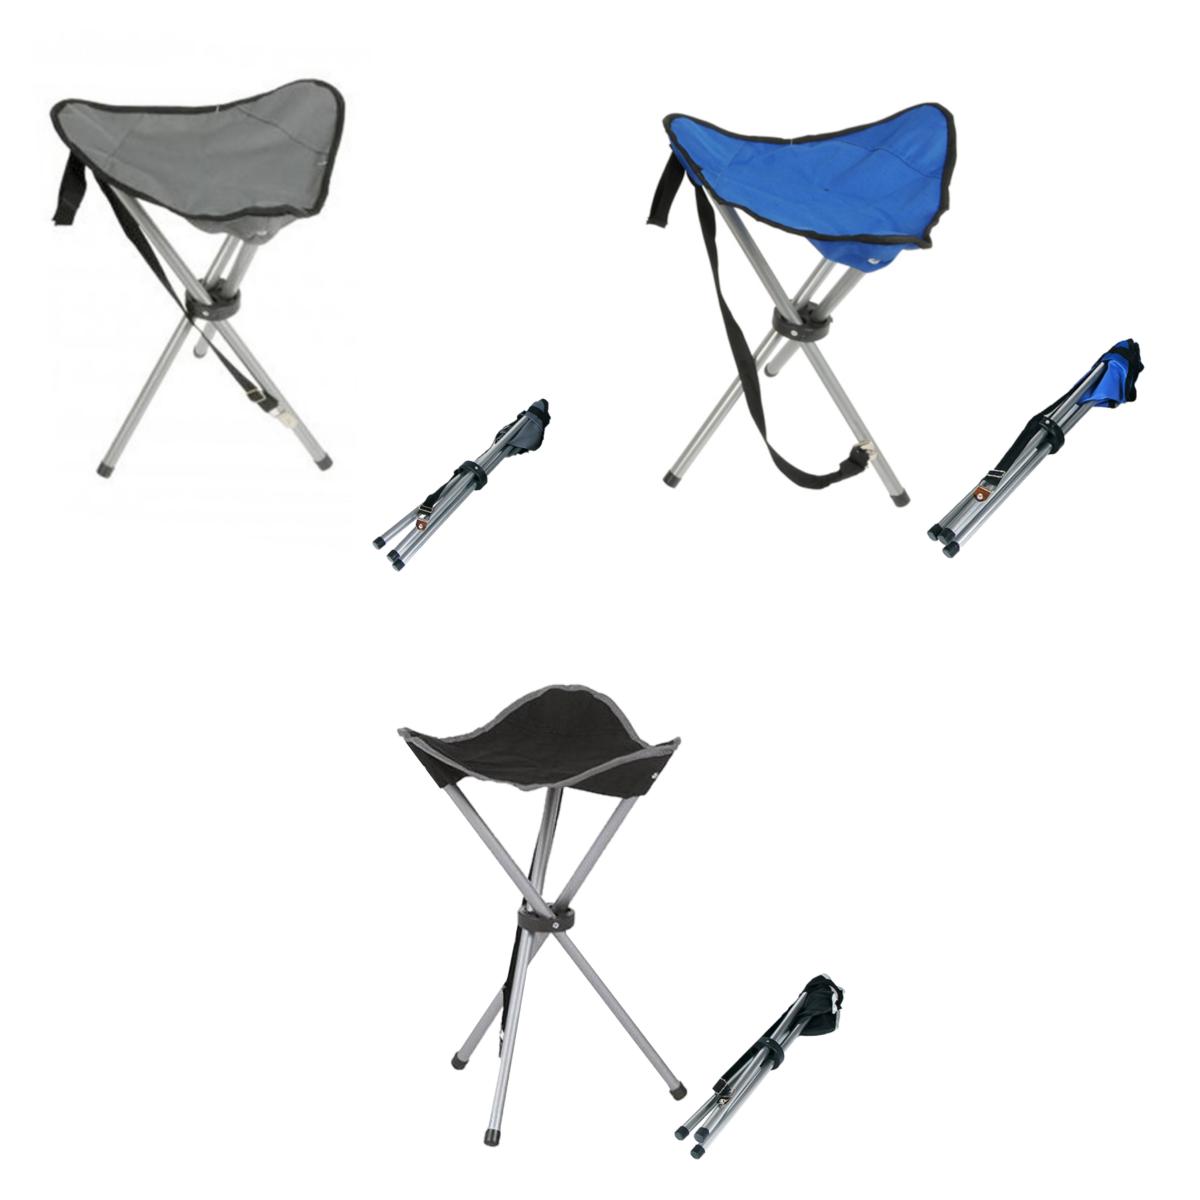 Campinghocker Dreibeinhocker Anglerhocker Campingstuhl Schwarz Grau Blau